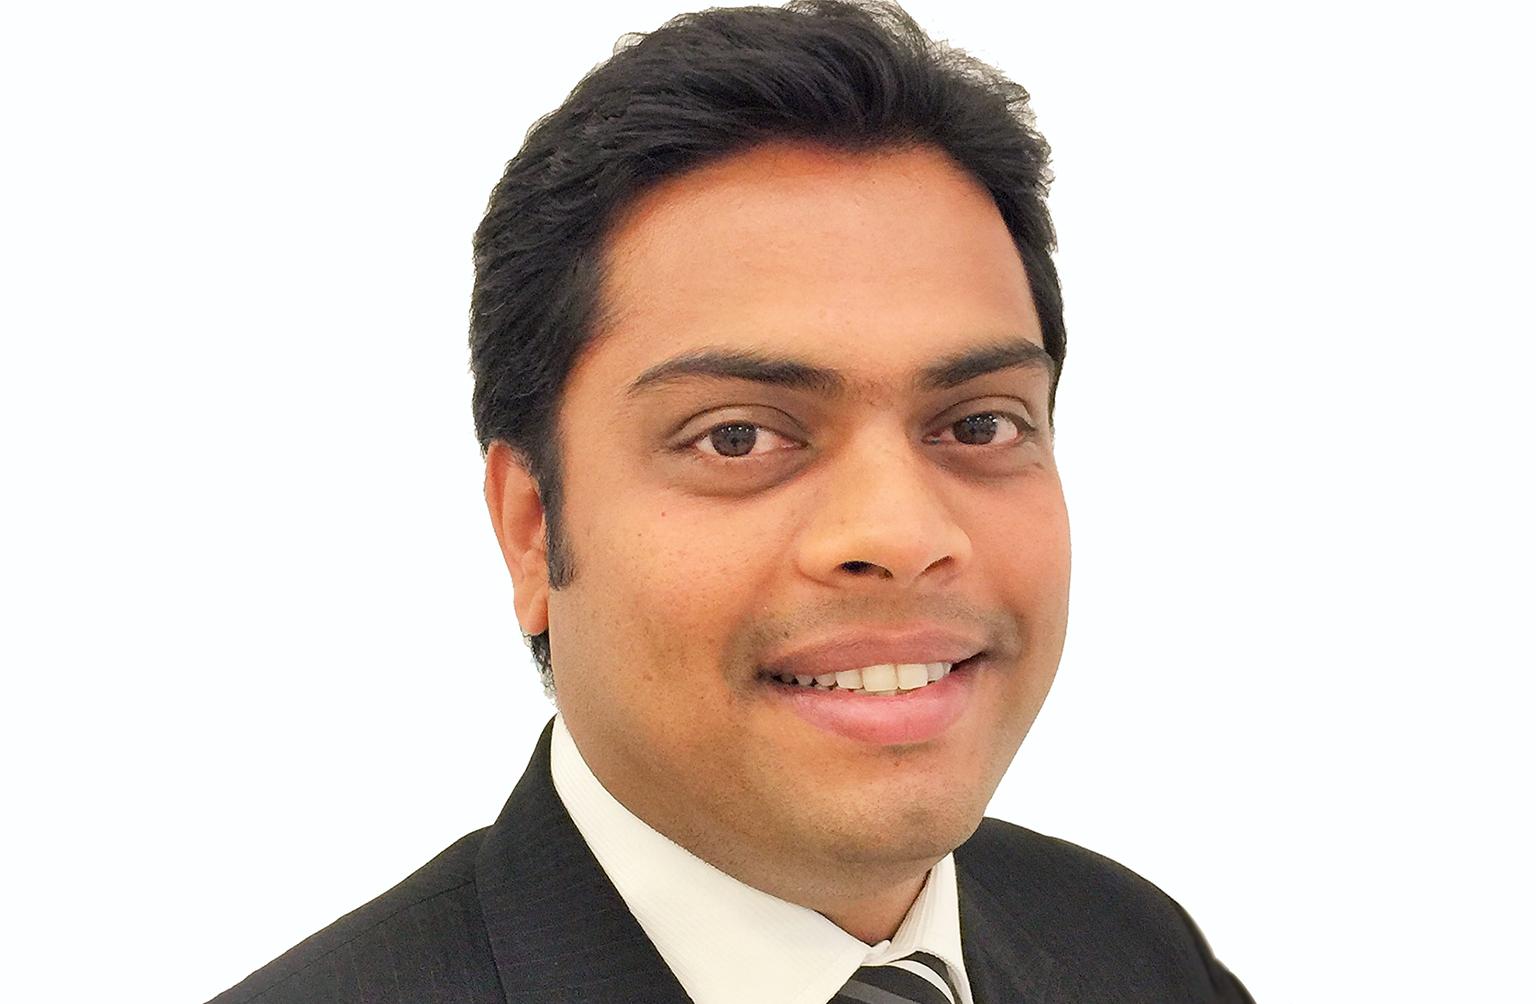 Gresham Technologies Hires Joel Jerome as Director of Sales, APAC